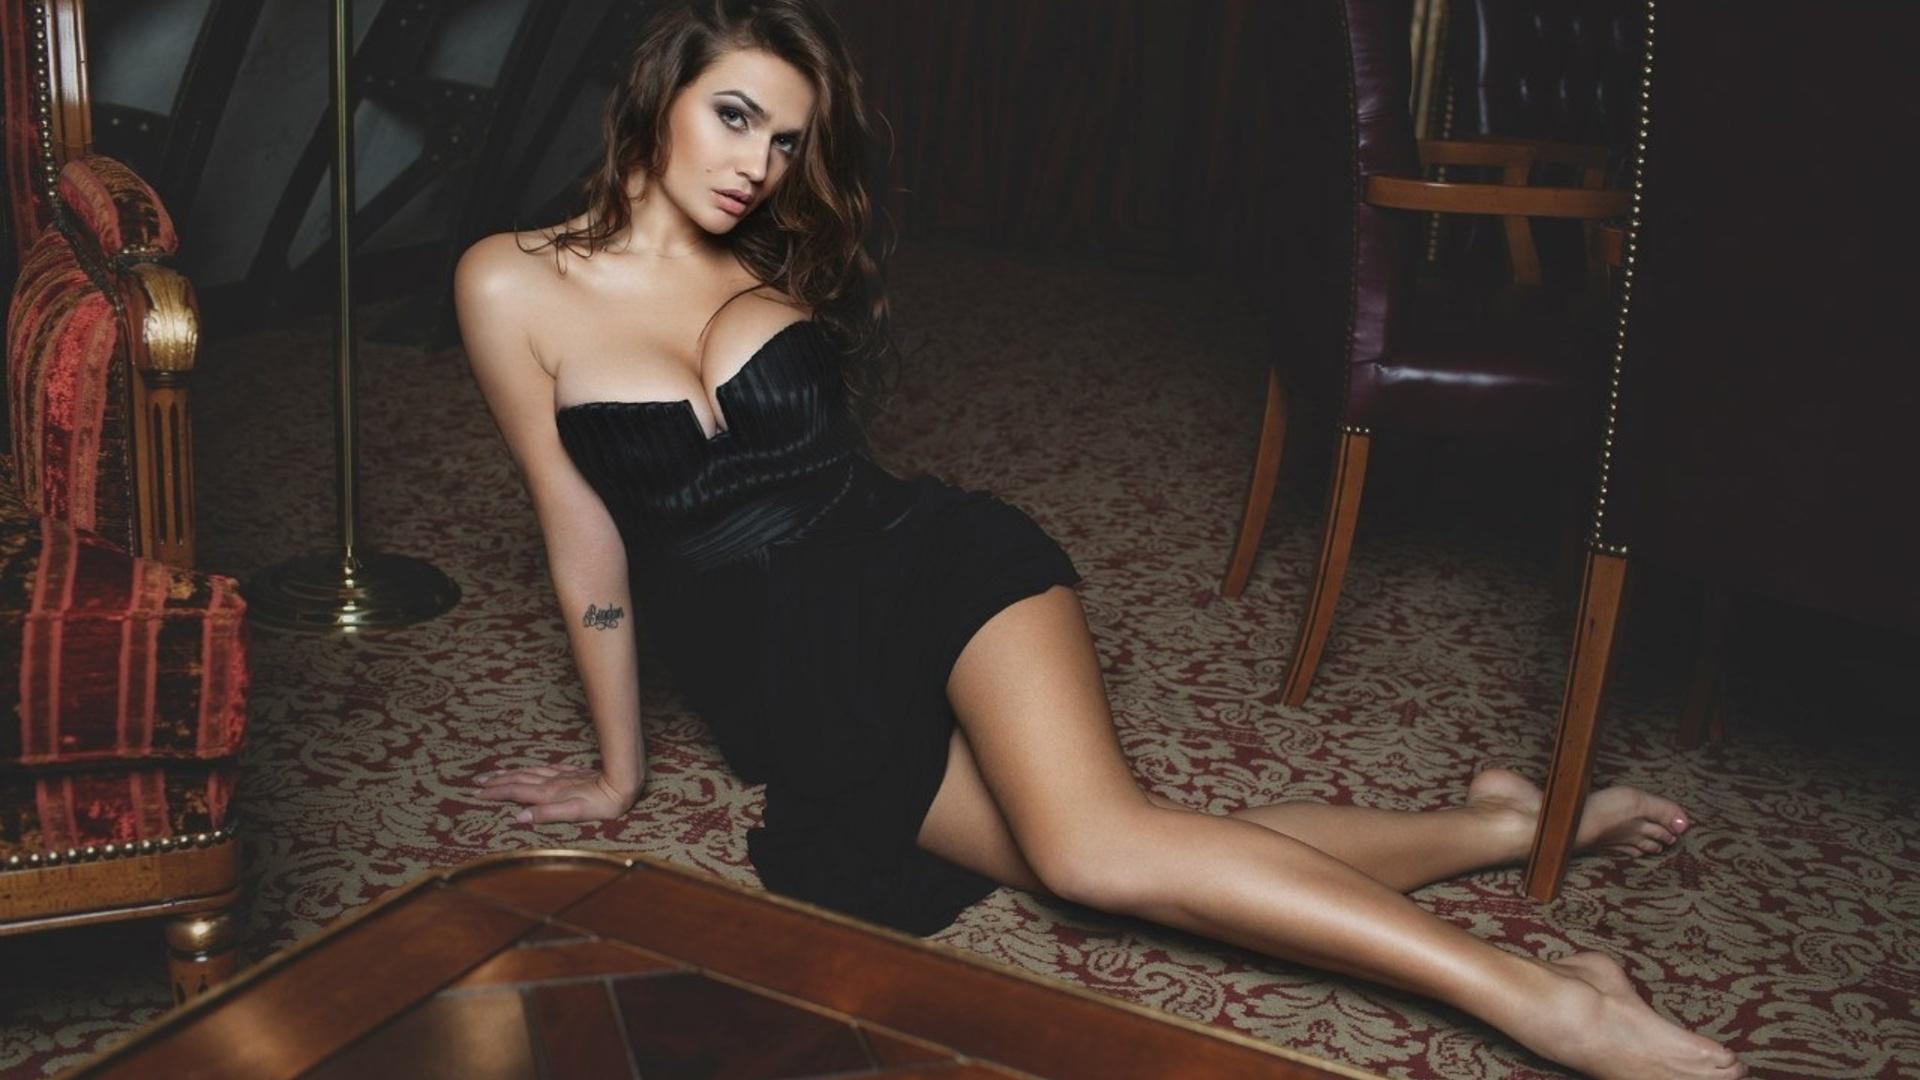 mavrin, alyona vodonaeva, девушка, брюнетка, модель, красивая